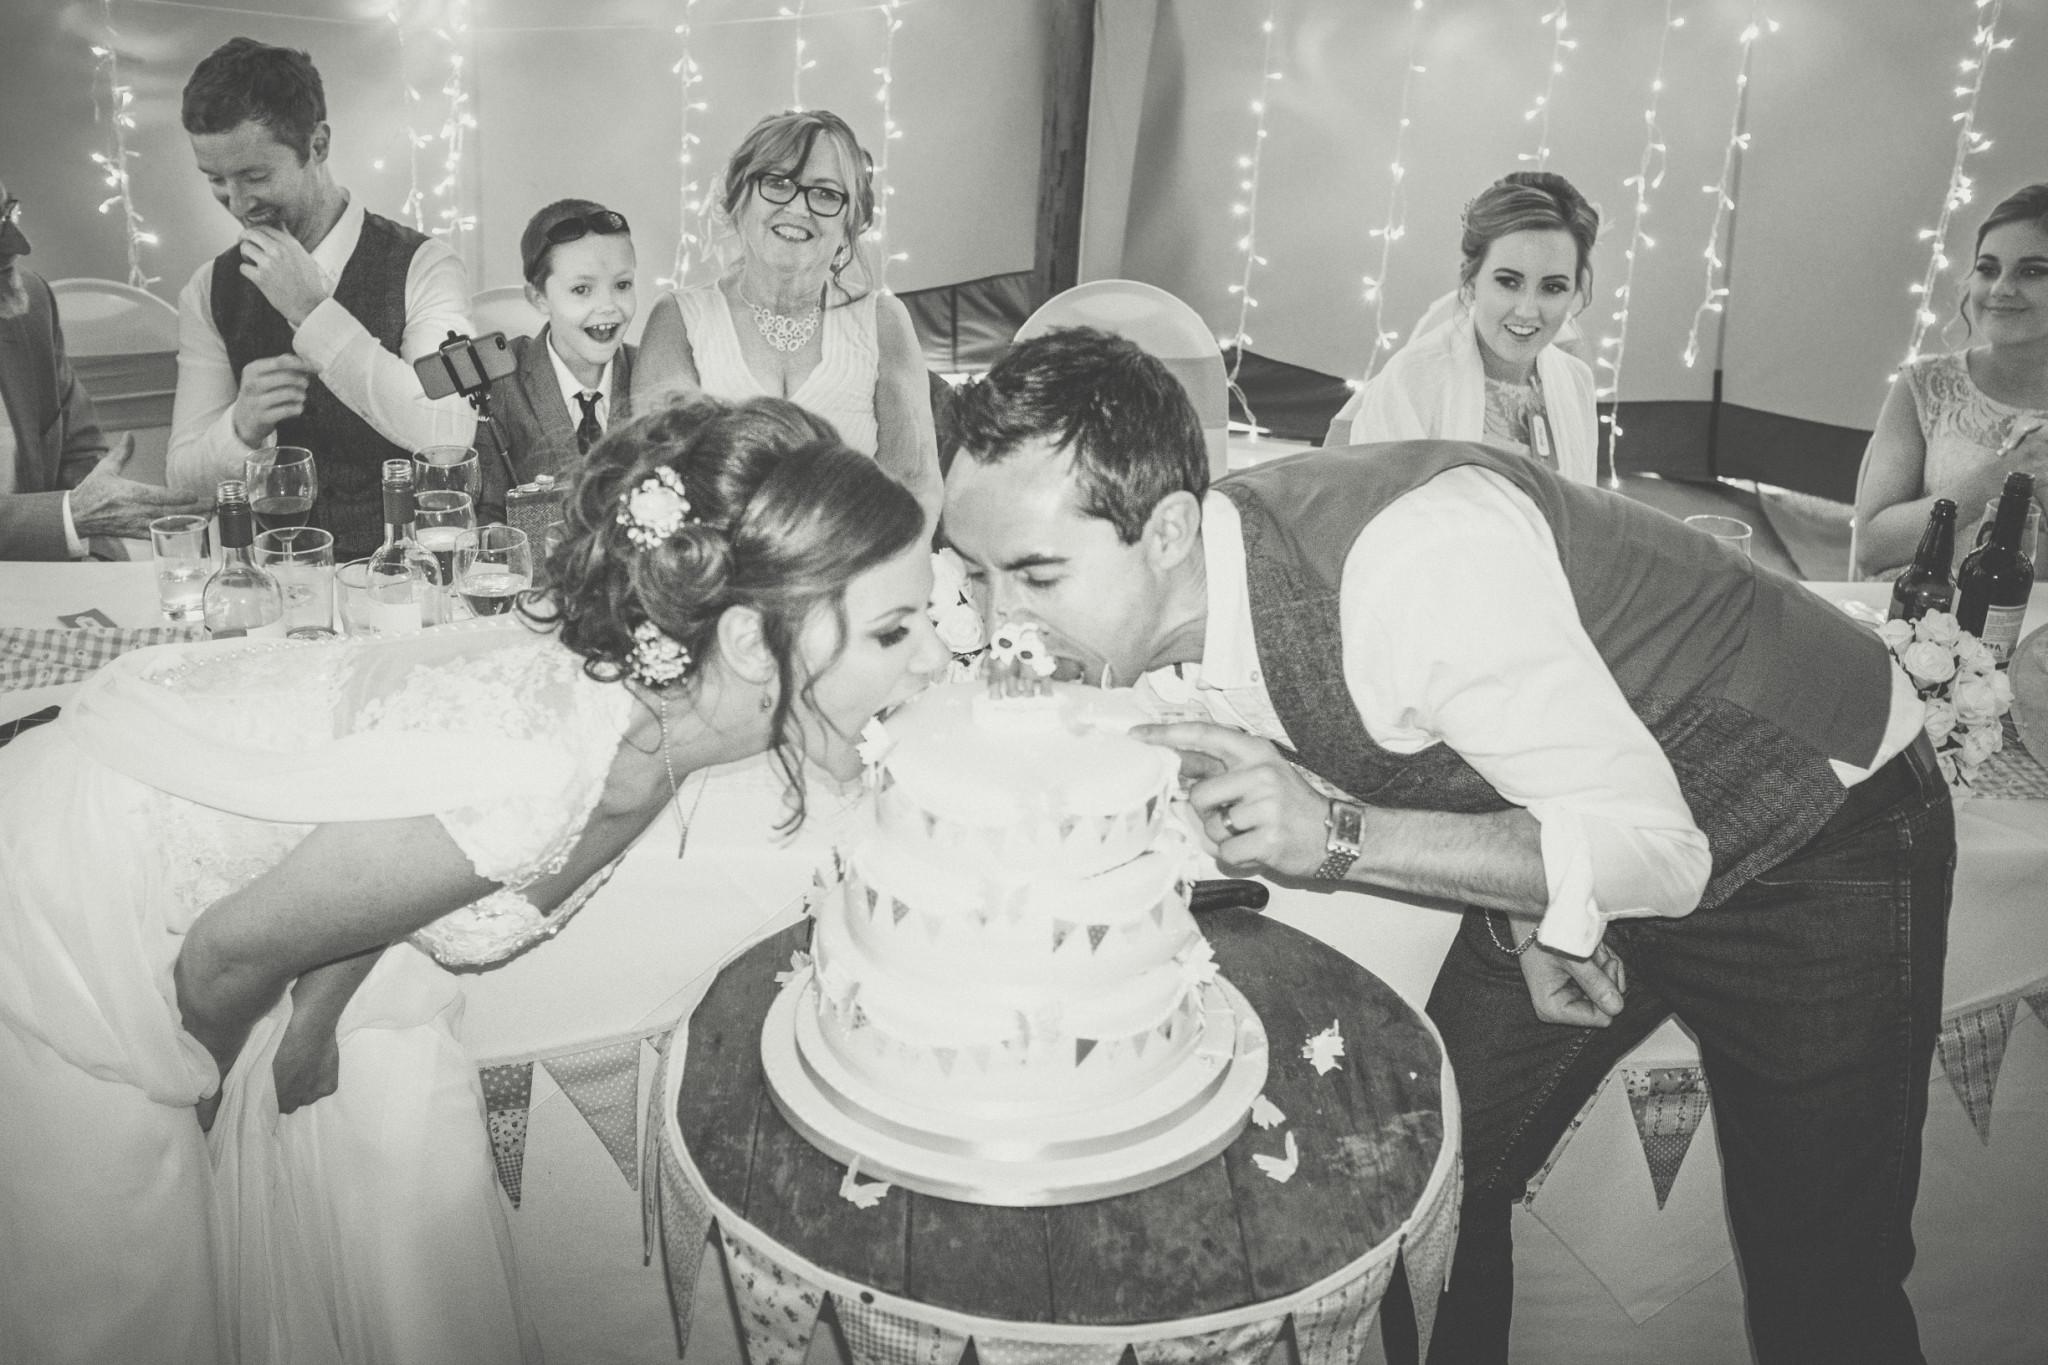 Charlene & Mark - The Hilden Brewery Lisburn. Wedding Photography By Andrew McKenna, Newcastle, County Down, Northern Ireland.